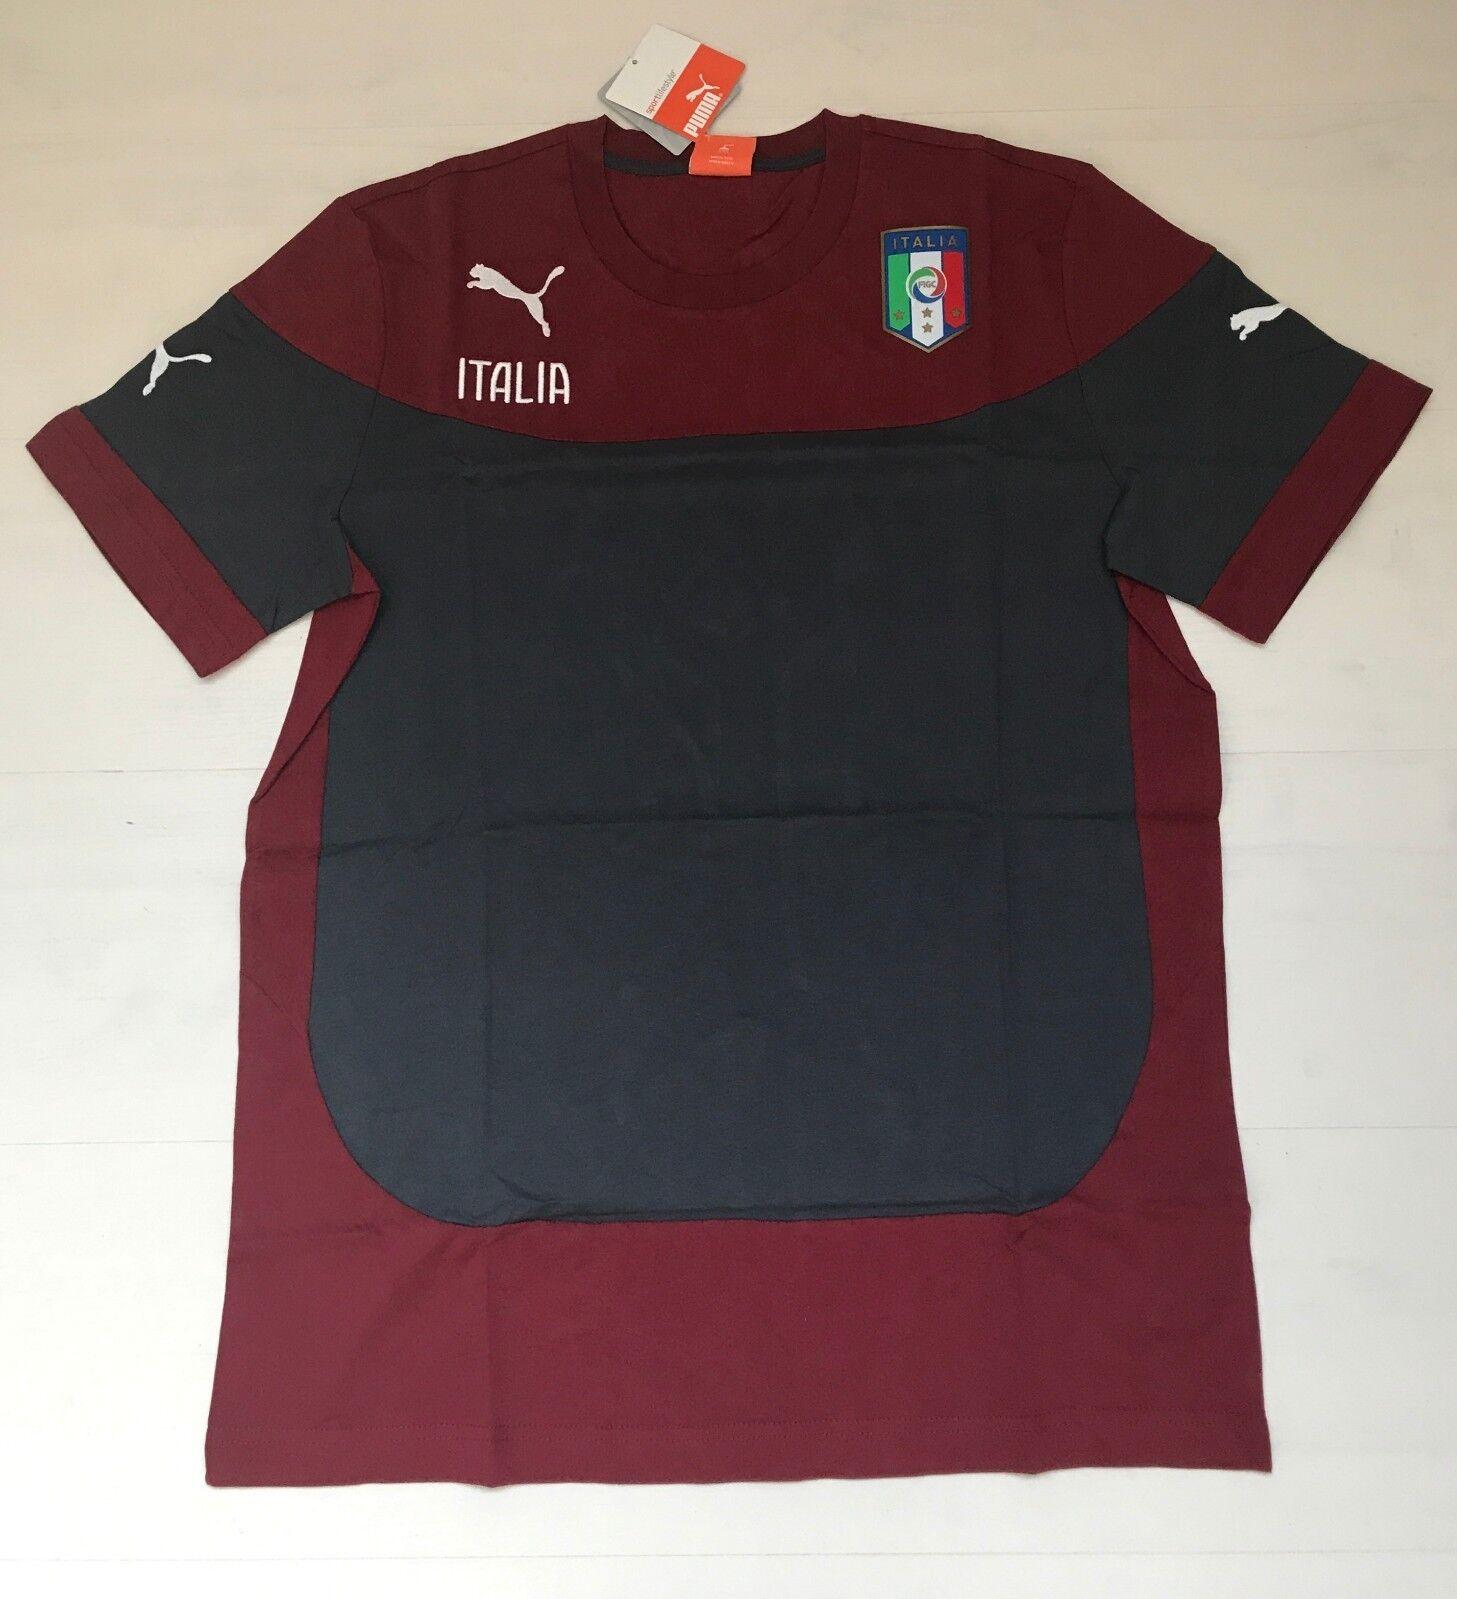 3356 PUMA ITALY T-SHIRT TEE T-SHIRT COTTON SHIRT MAN 744272 04